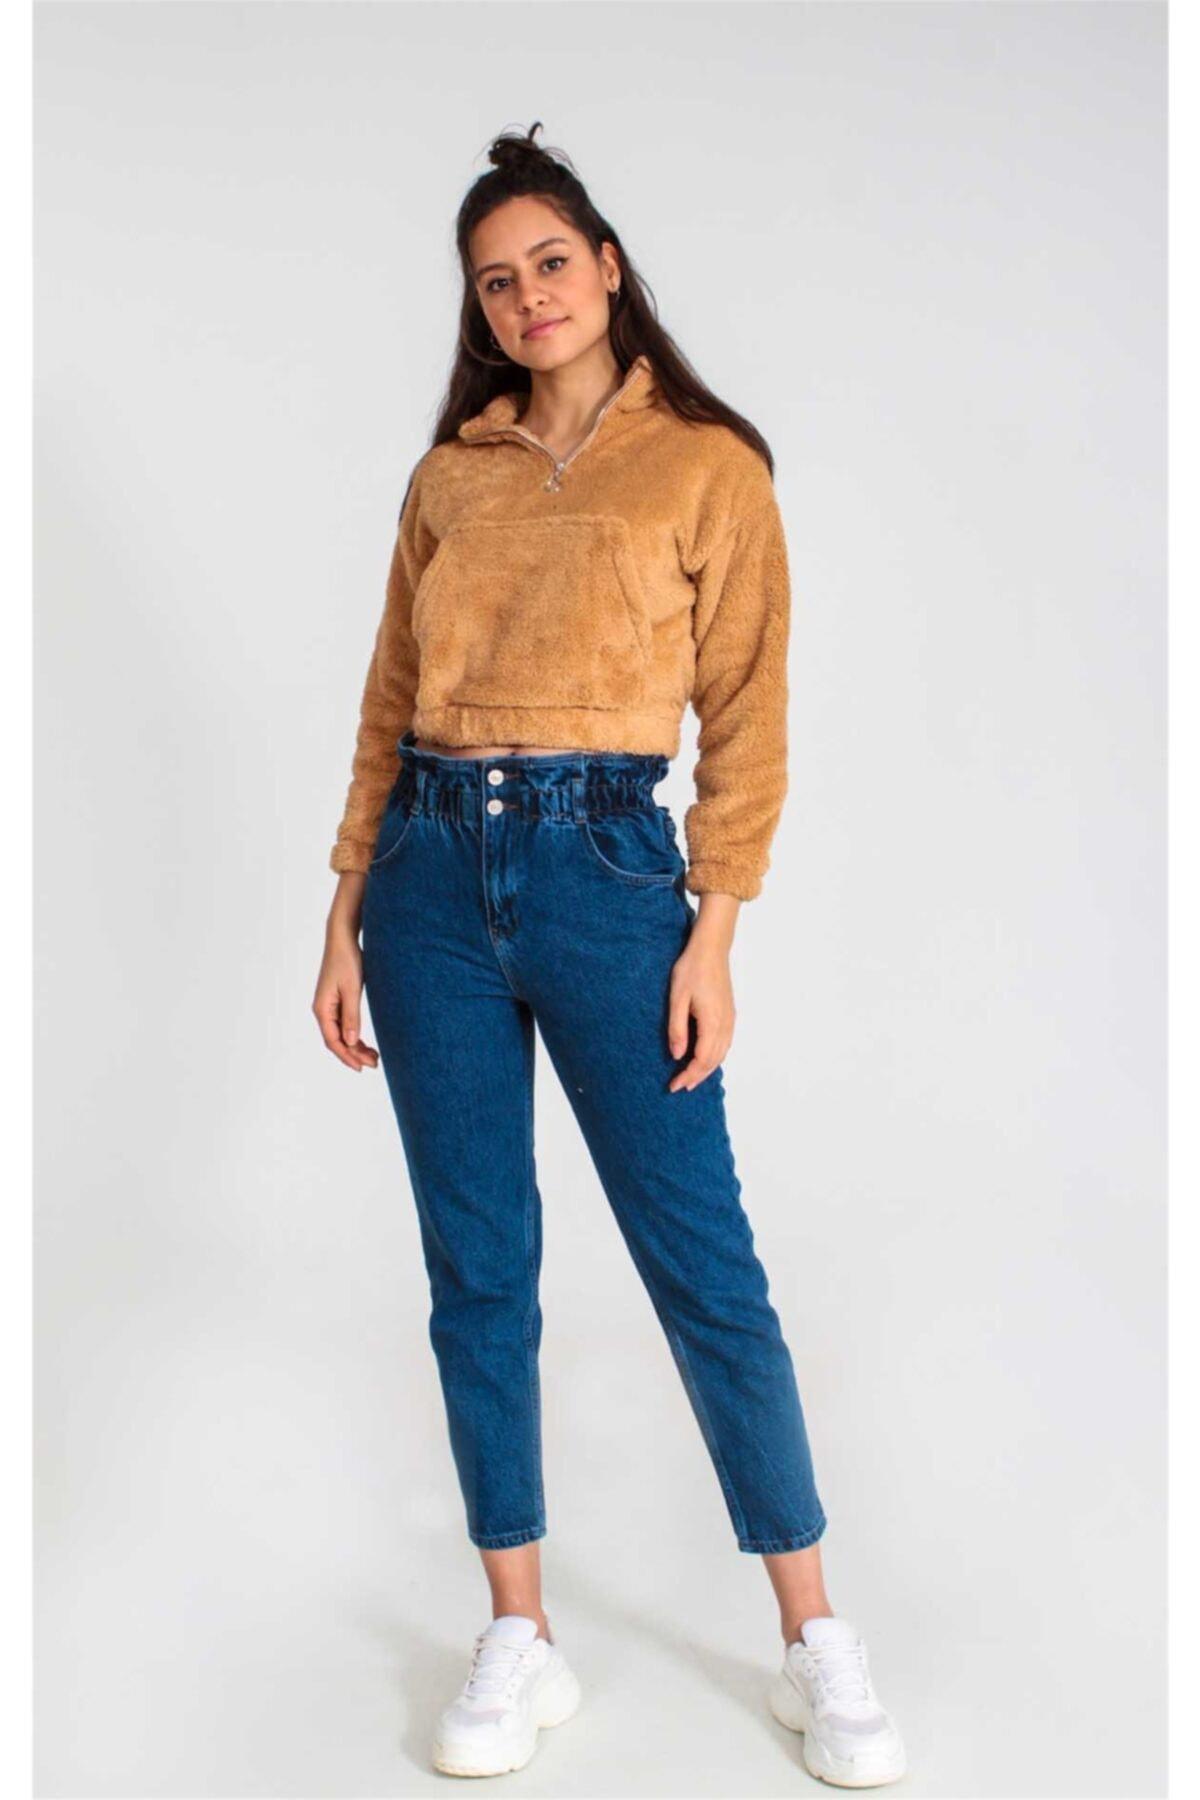 Collezione Mavi Kadın Denim Pantolon 1